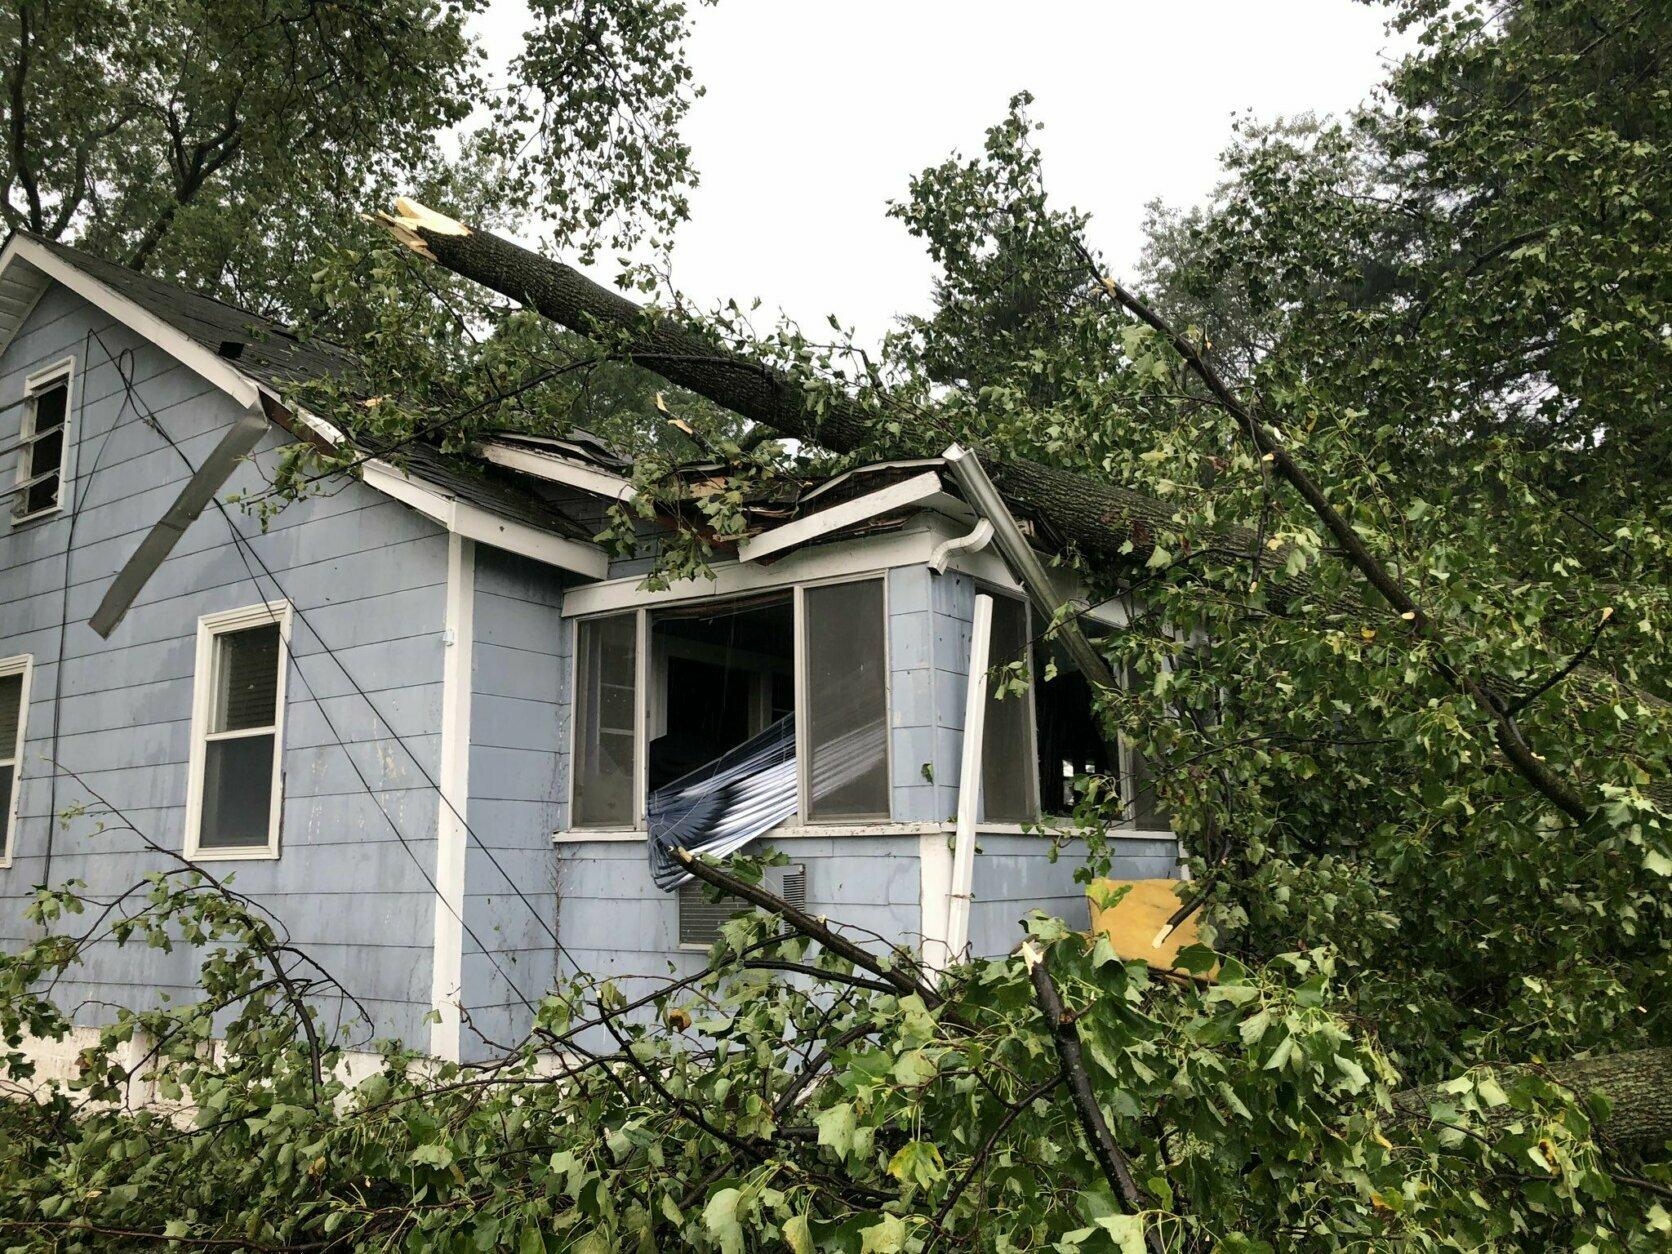 <p></noscript>High winds sent a poplar tree into a house near Annapolis Thursday.</p><div class=